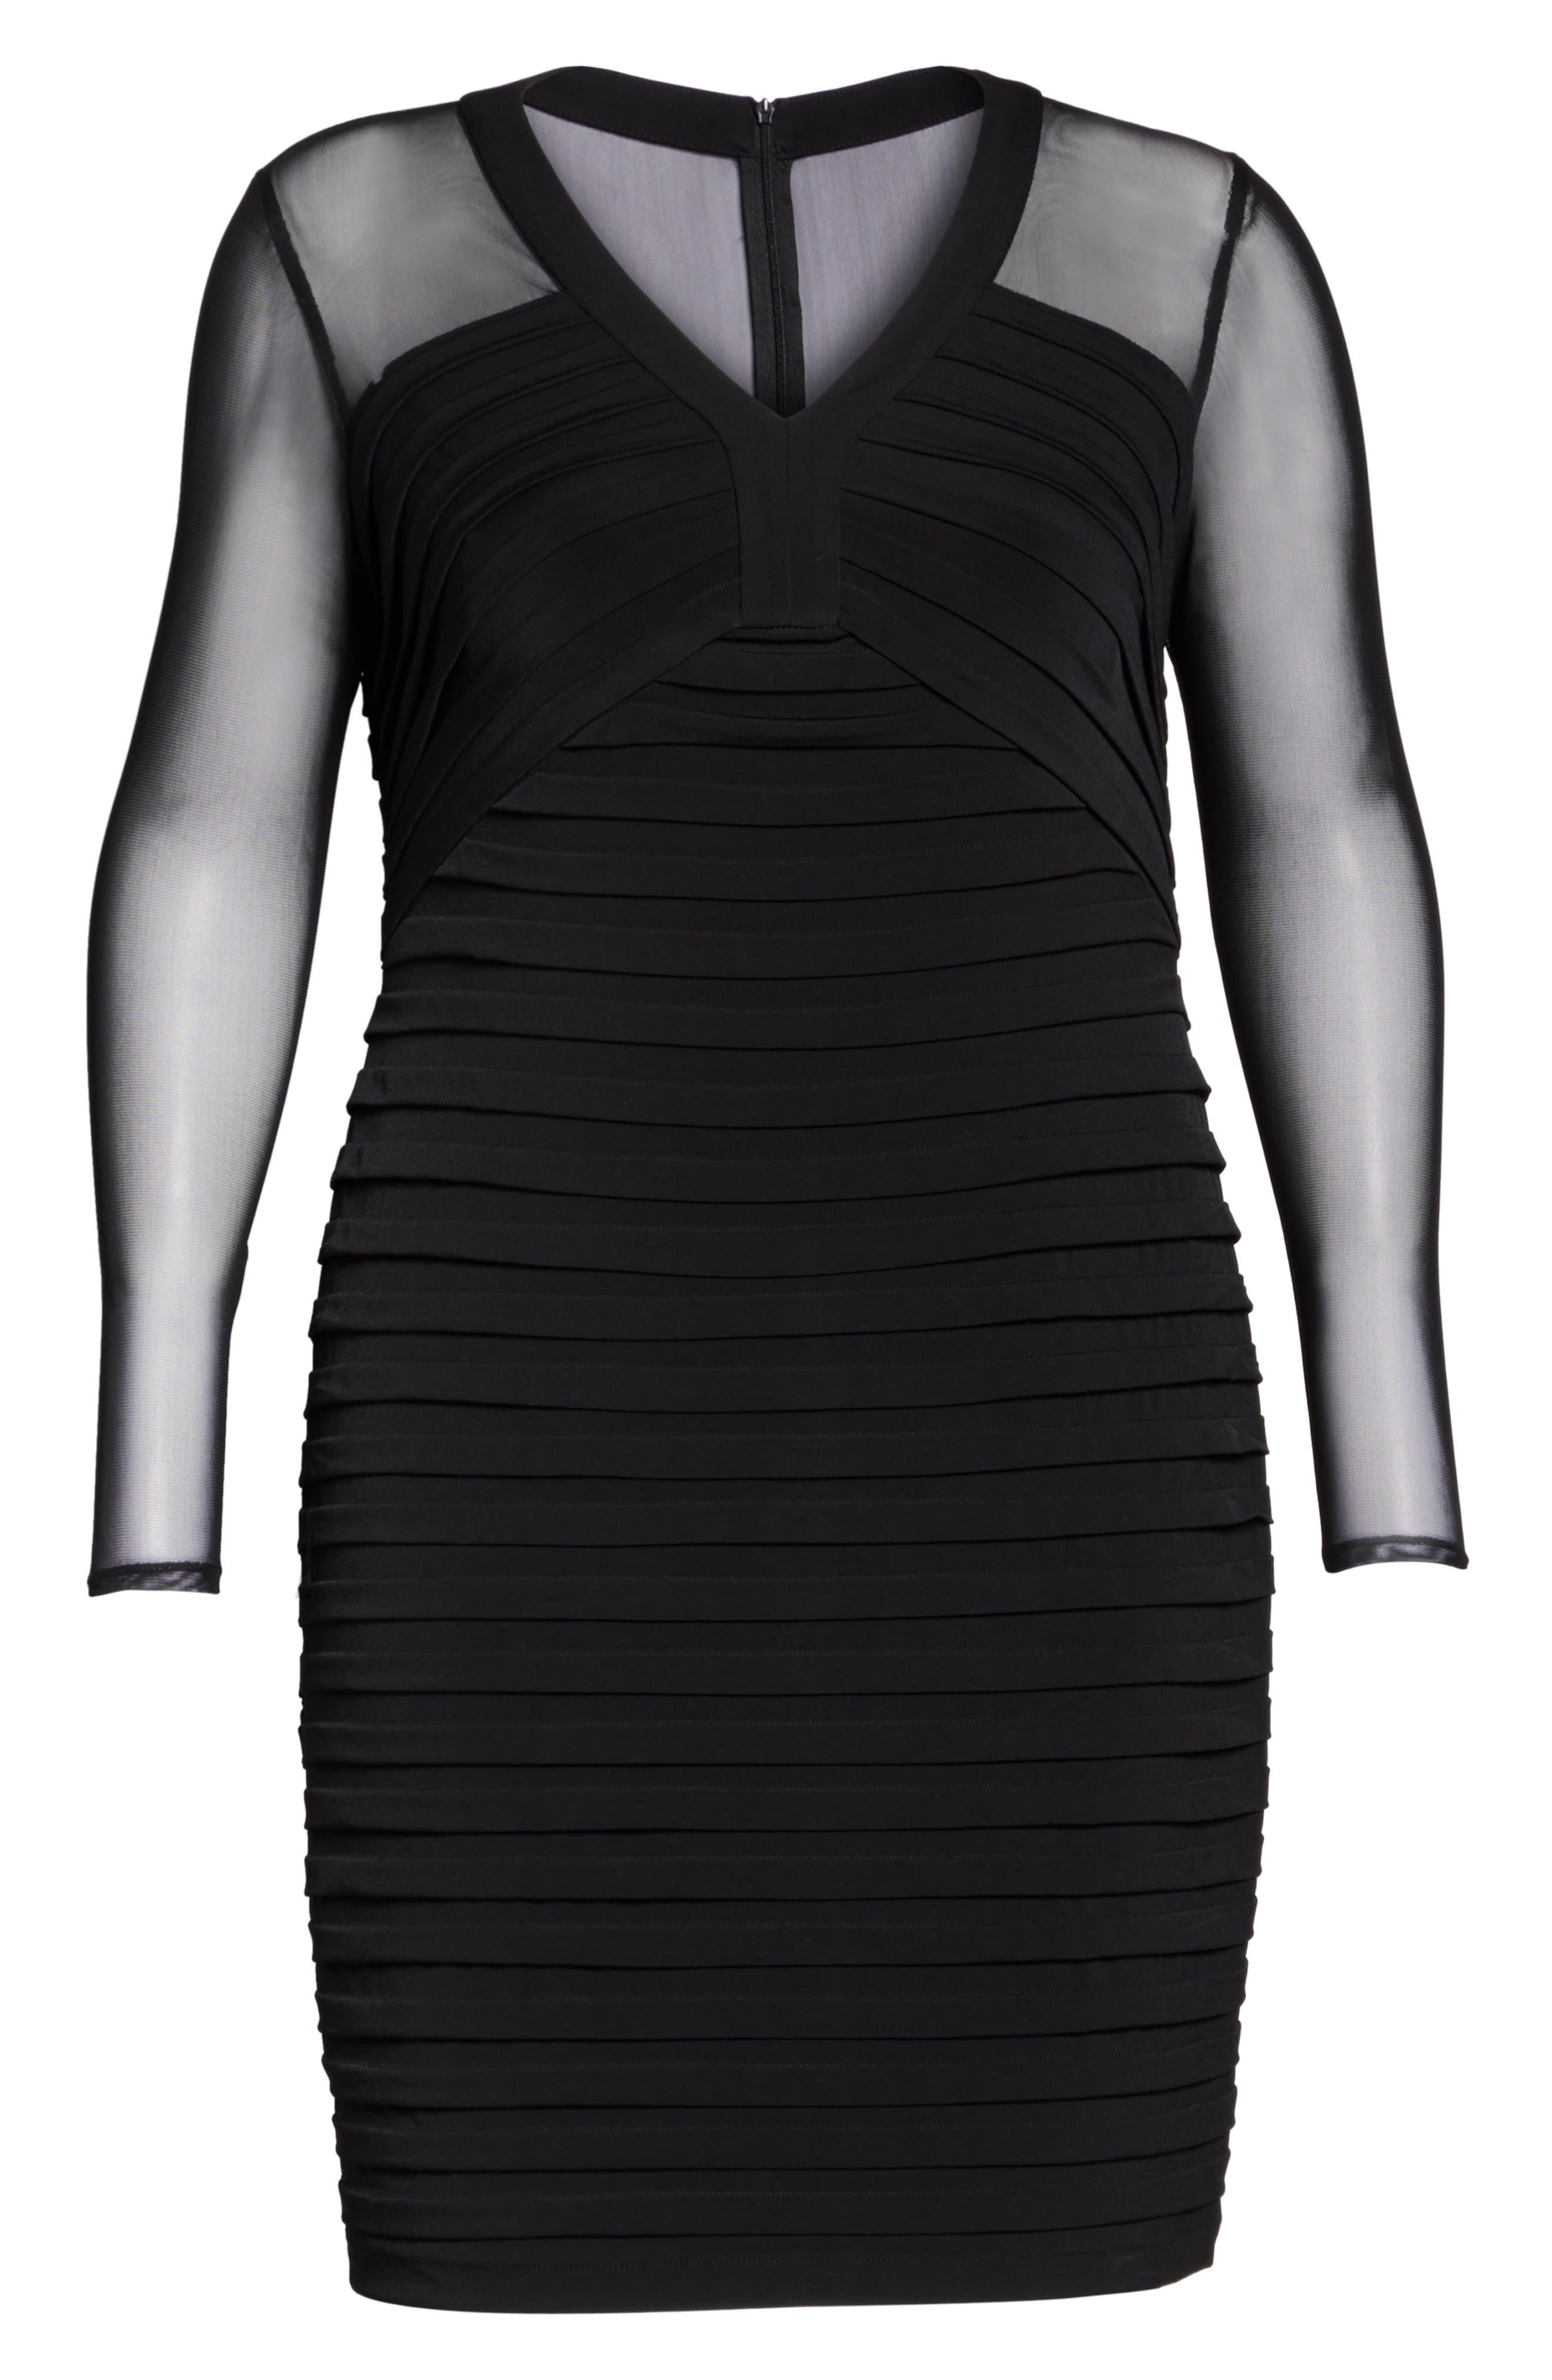 Shutter Pleat Jersey Skeath Dress,                             Alternate thumbnail 7, color,                             BLACK